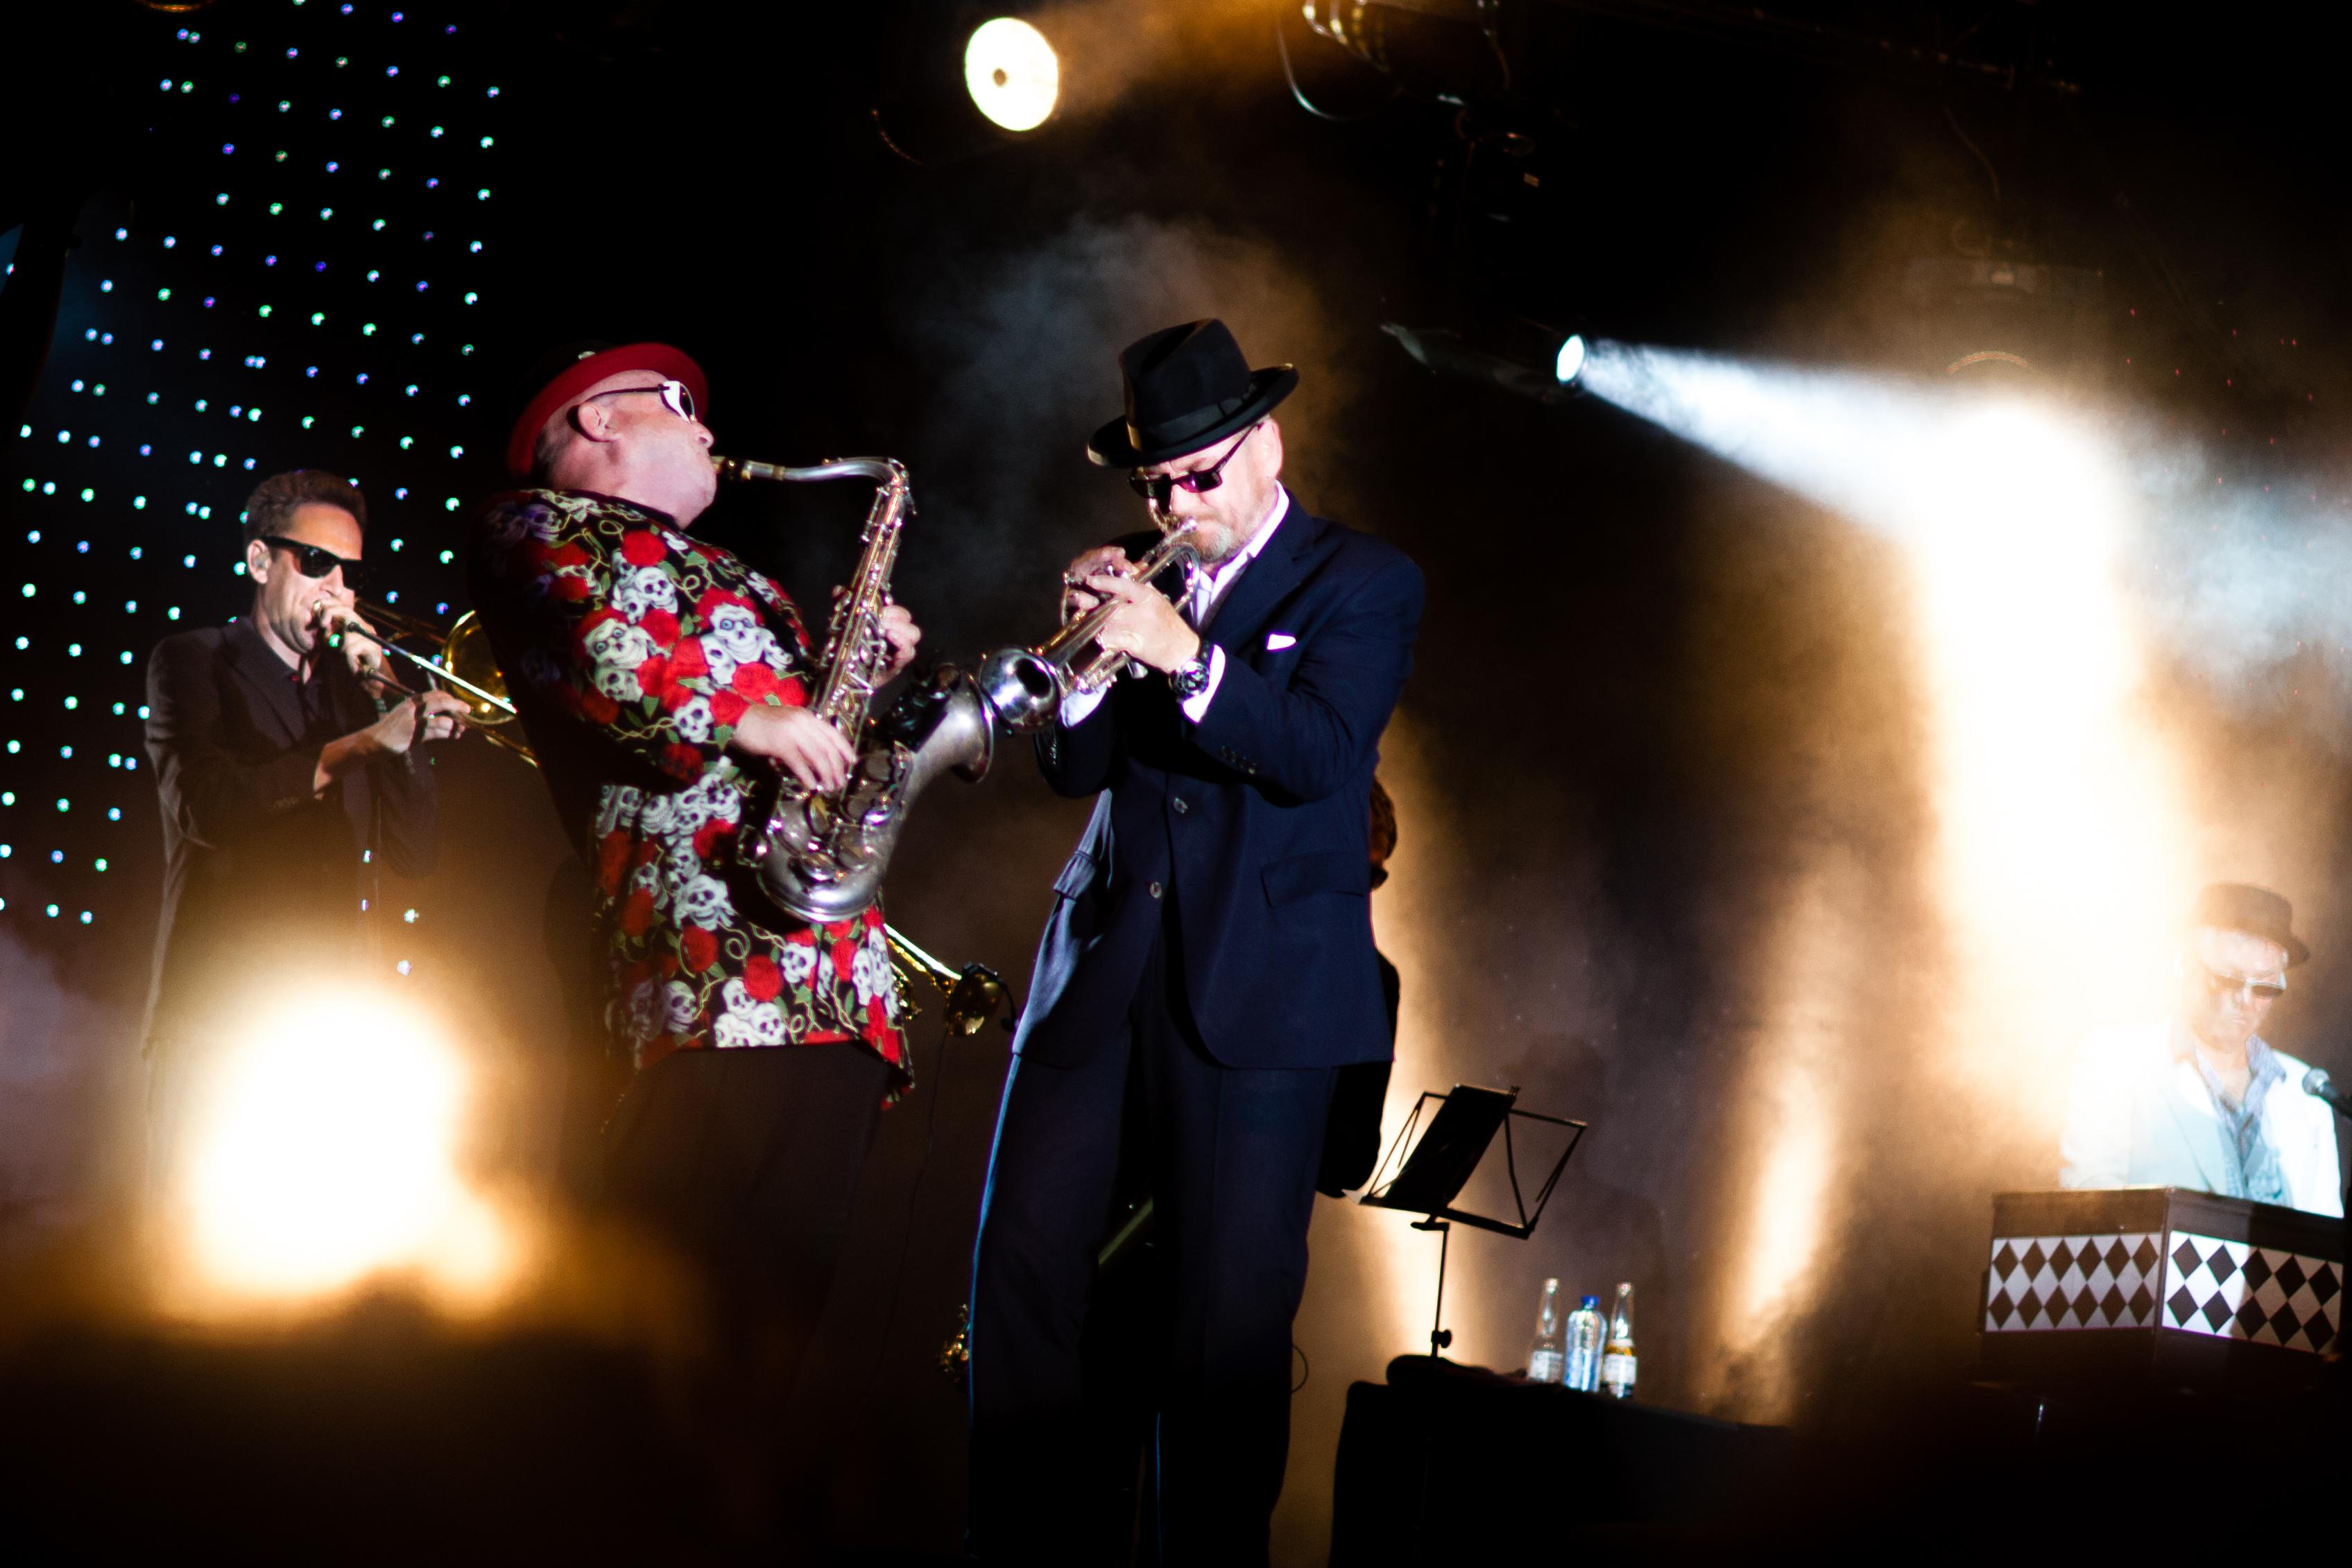 madness concert nederland